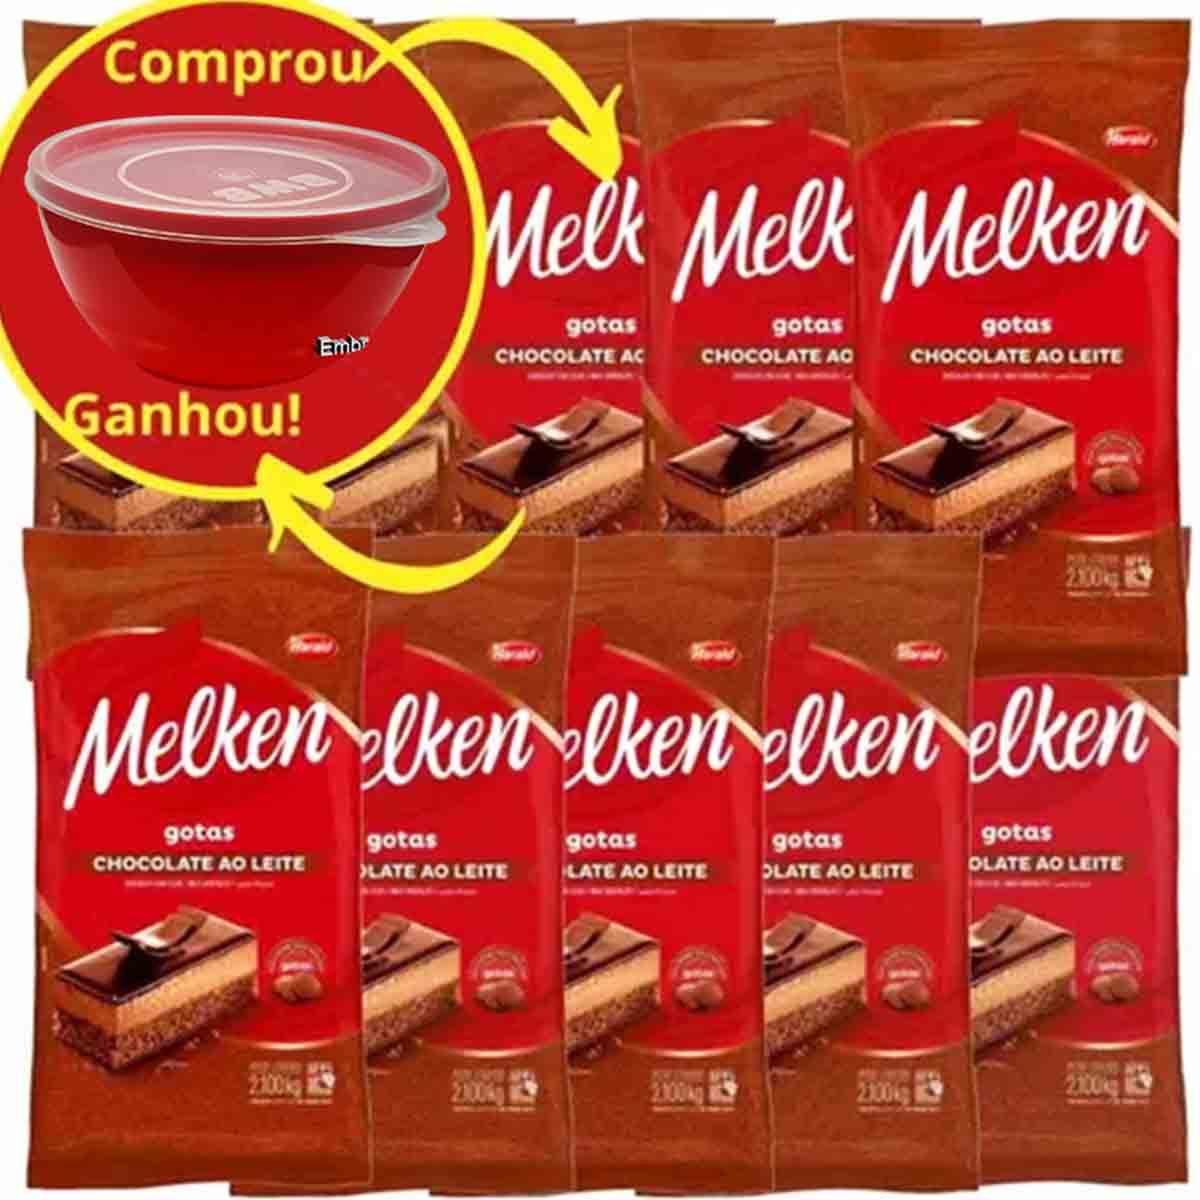 Chocolate ao Leite Harald Melken Gotas 2,1kg kit C/10